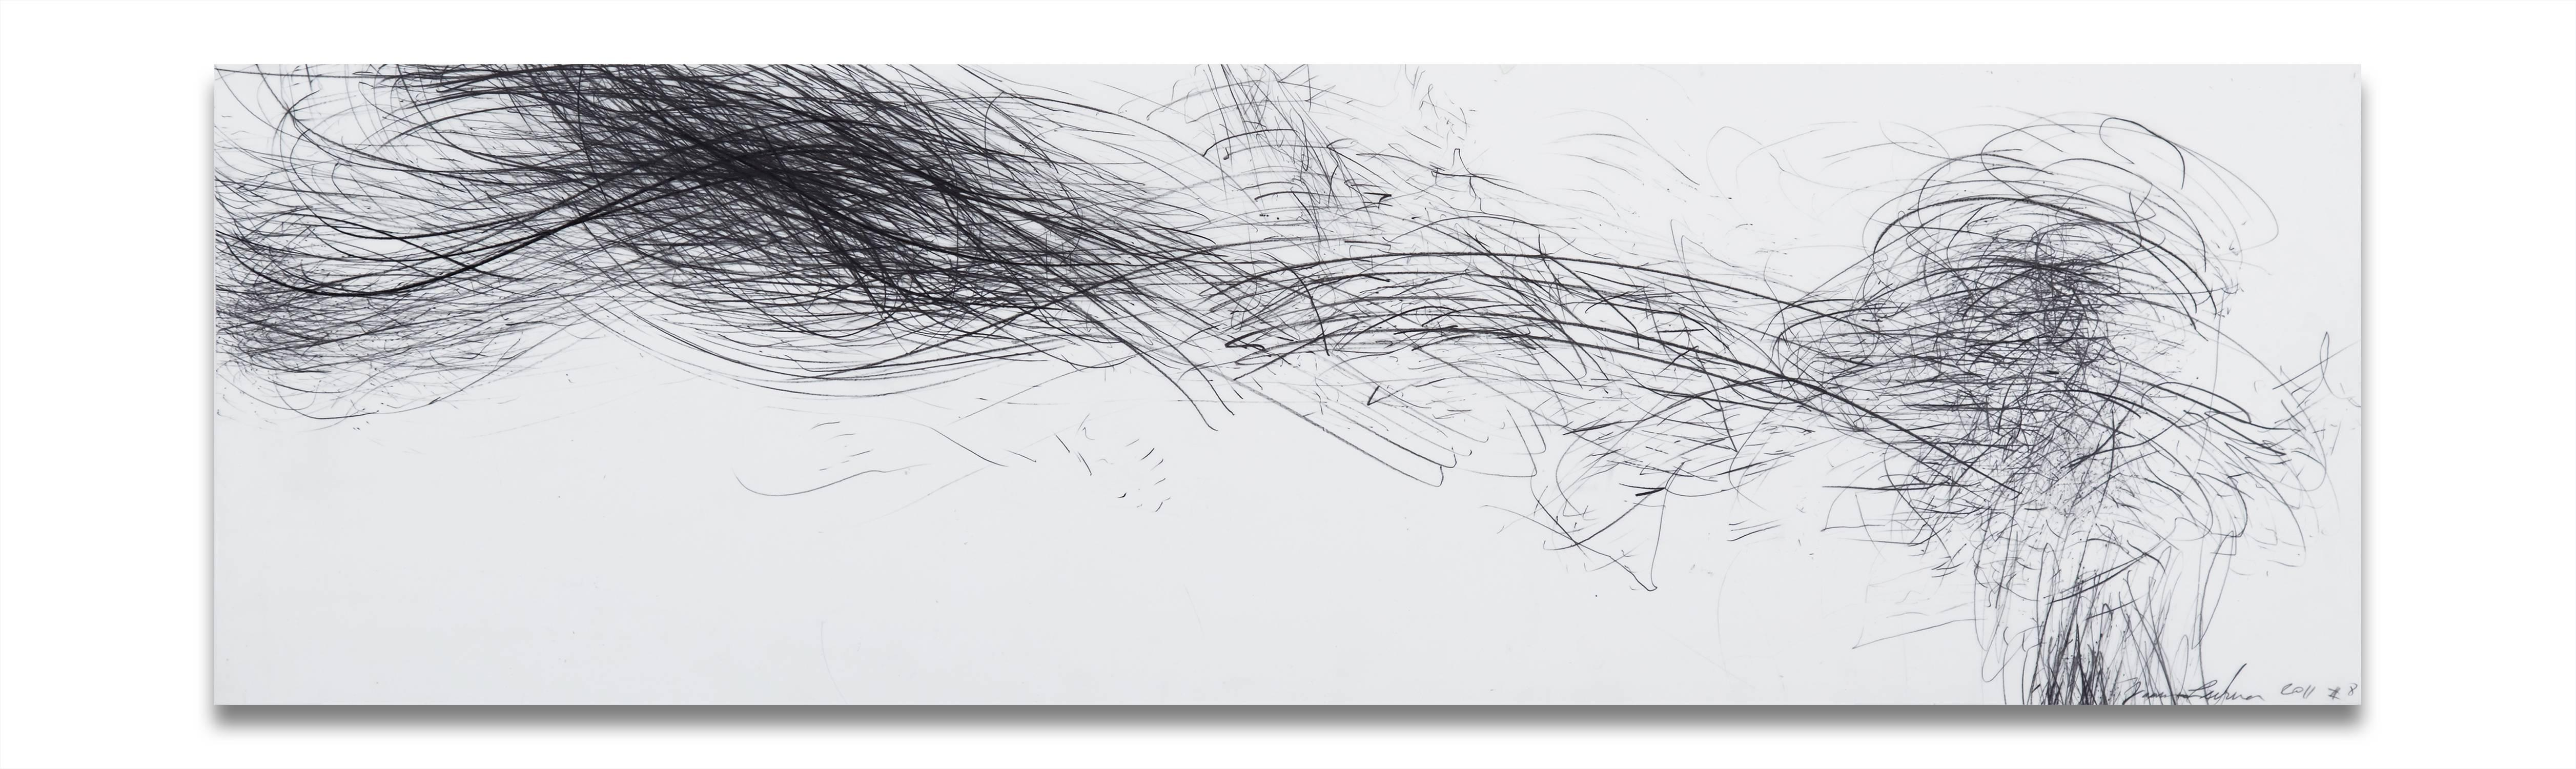 Storm Series Horizontal 8 (Abstract drawing)